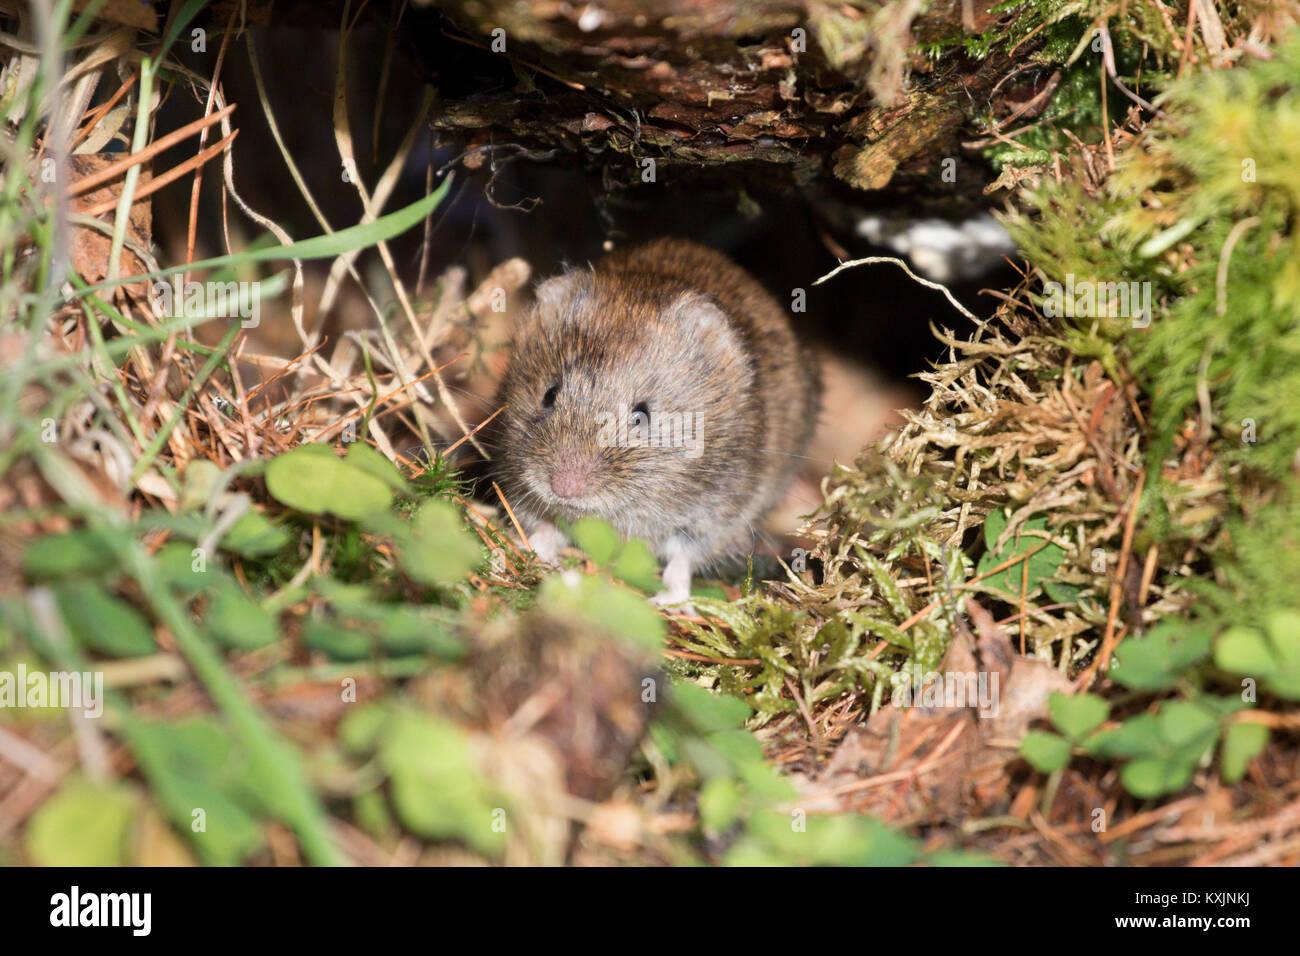 Bank Vole (Myodes glareolus) in the forest, Scottish Highlands, United Kingdom - Stock Image